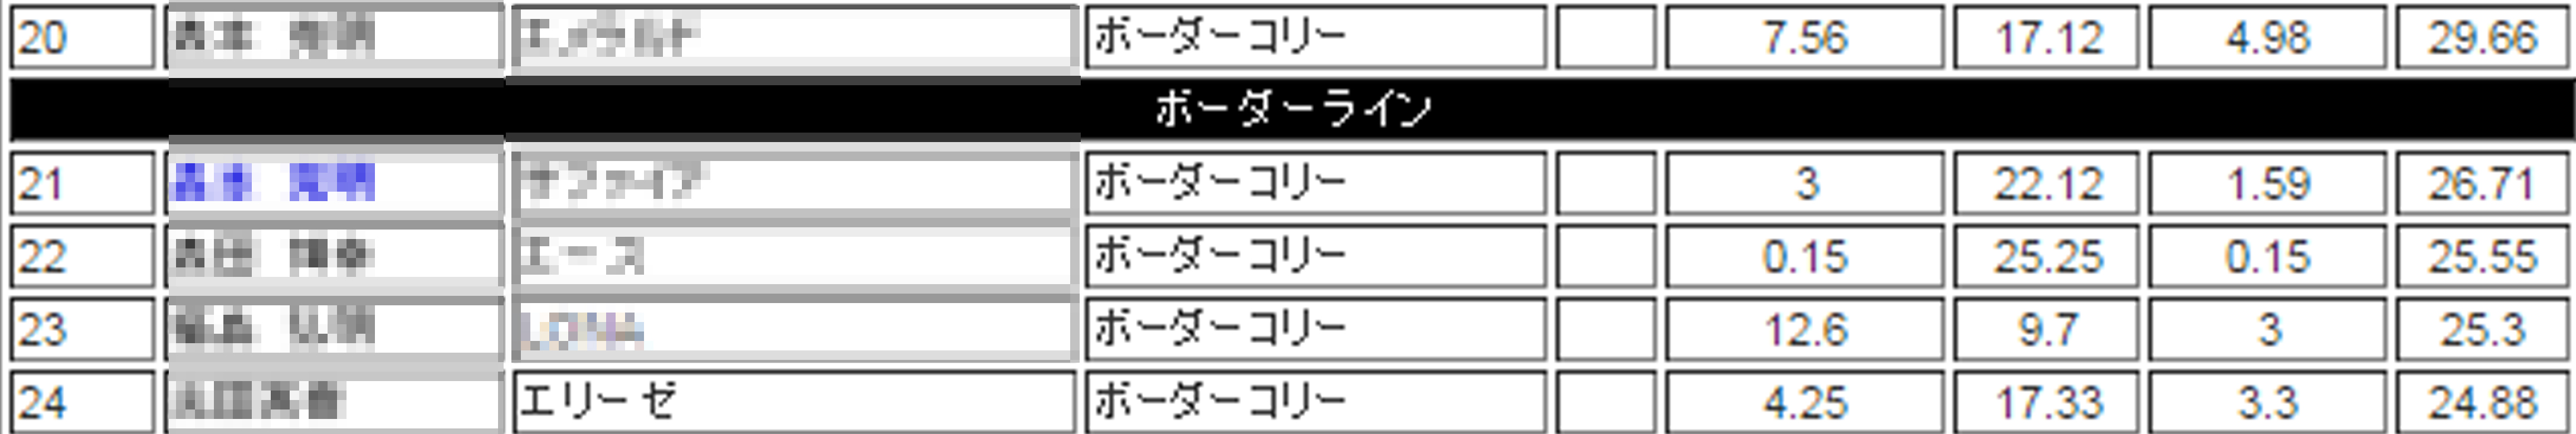 nenkan_kekka.jpg